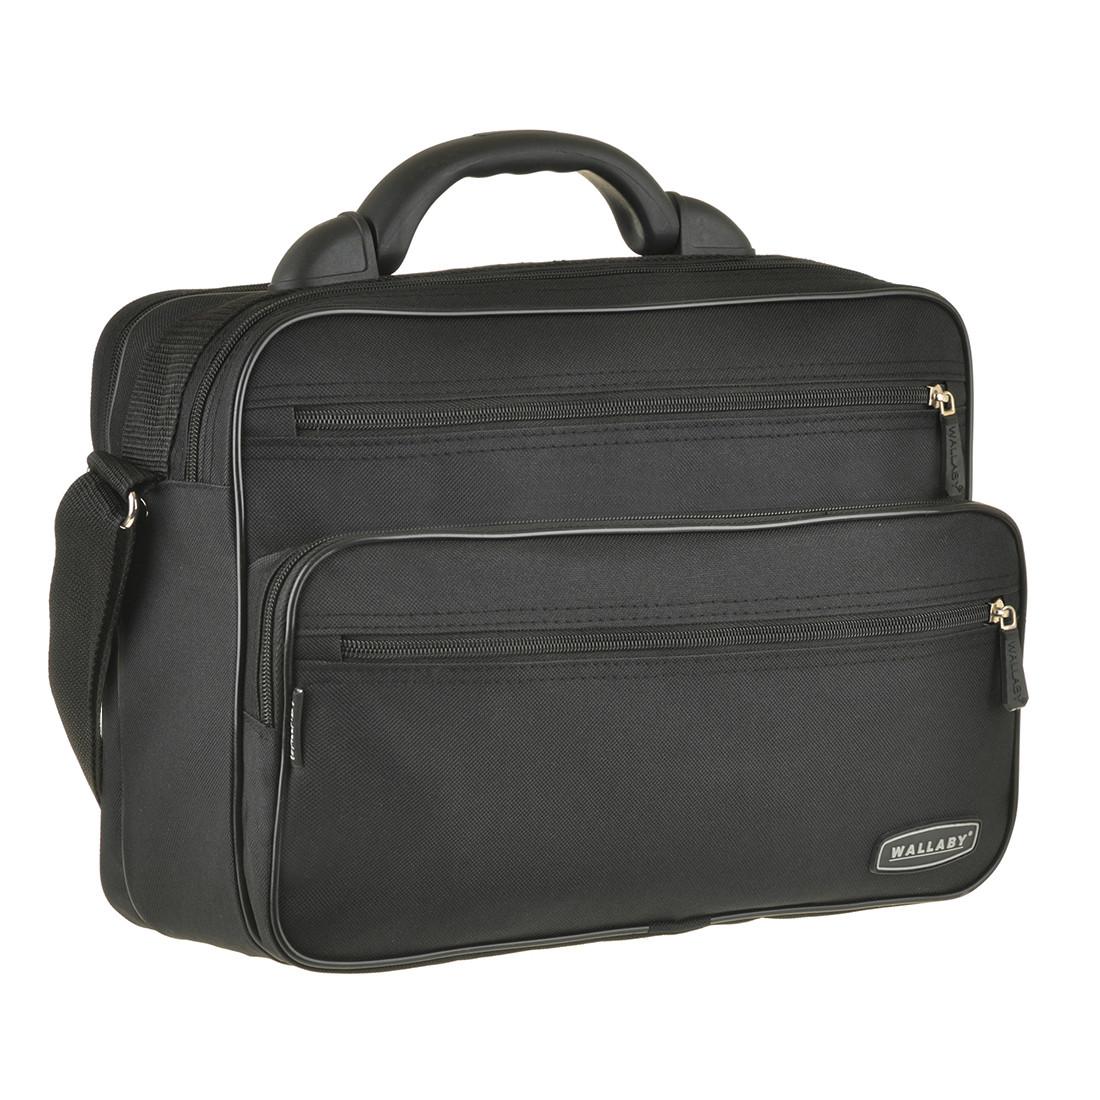 Мужская сумка Wallaby 36х26х16 ткань полиэстер, пластиковая ручка  в 2651